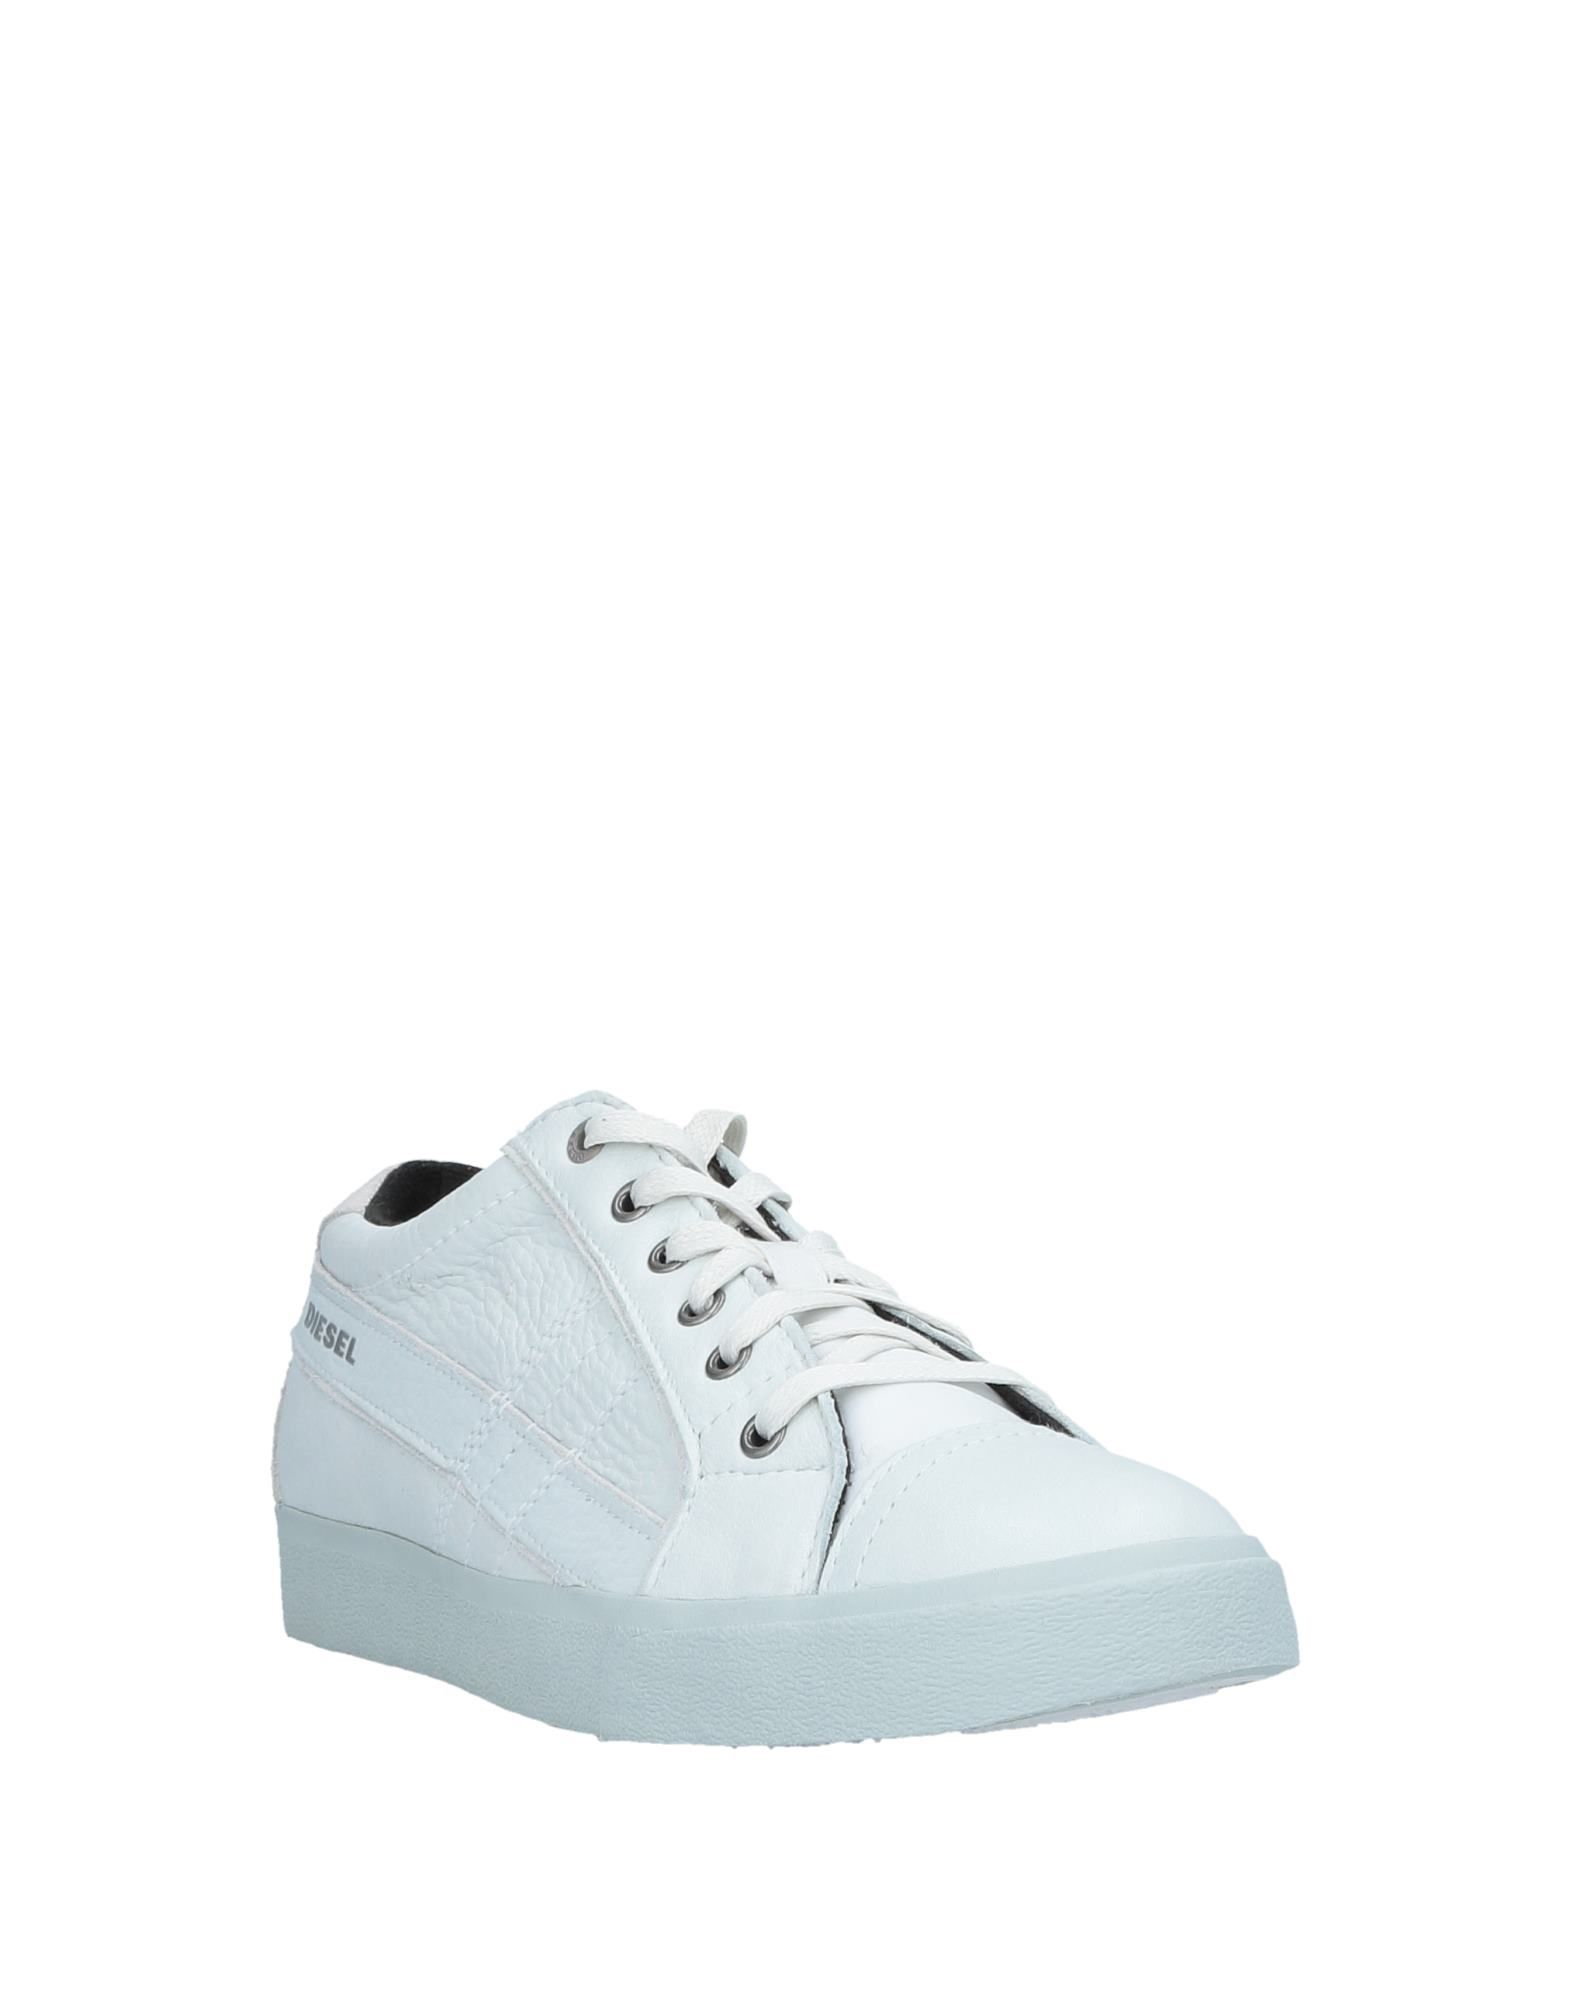 Haltbare Mode billige Schuhe Diesel Sneakers Herren  11532227NC Heiße Heiße 11532227NC Schuhe 7051b7